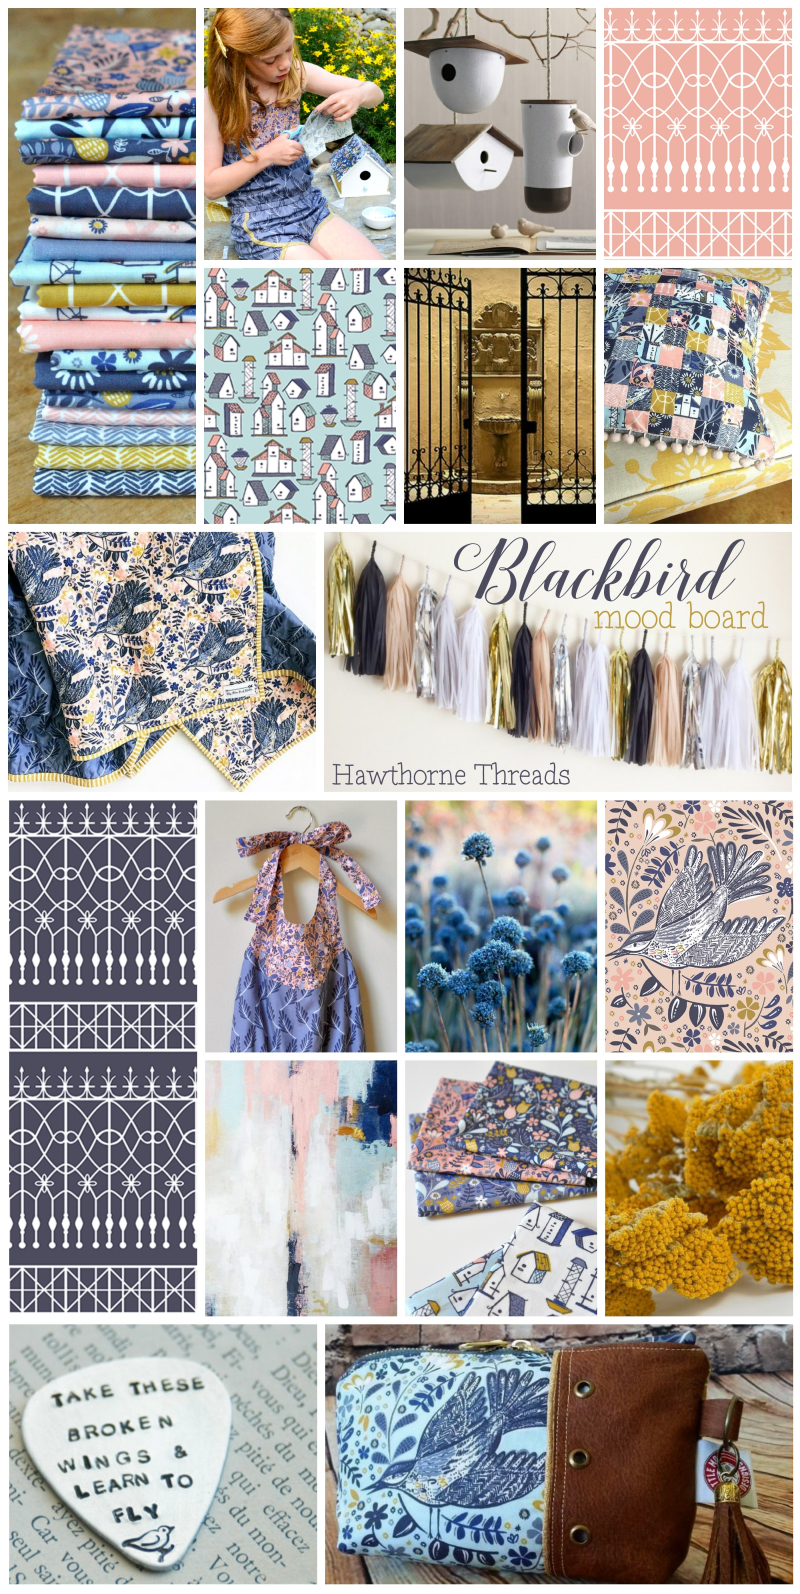 Blackbird fabric Mood Board